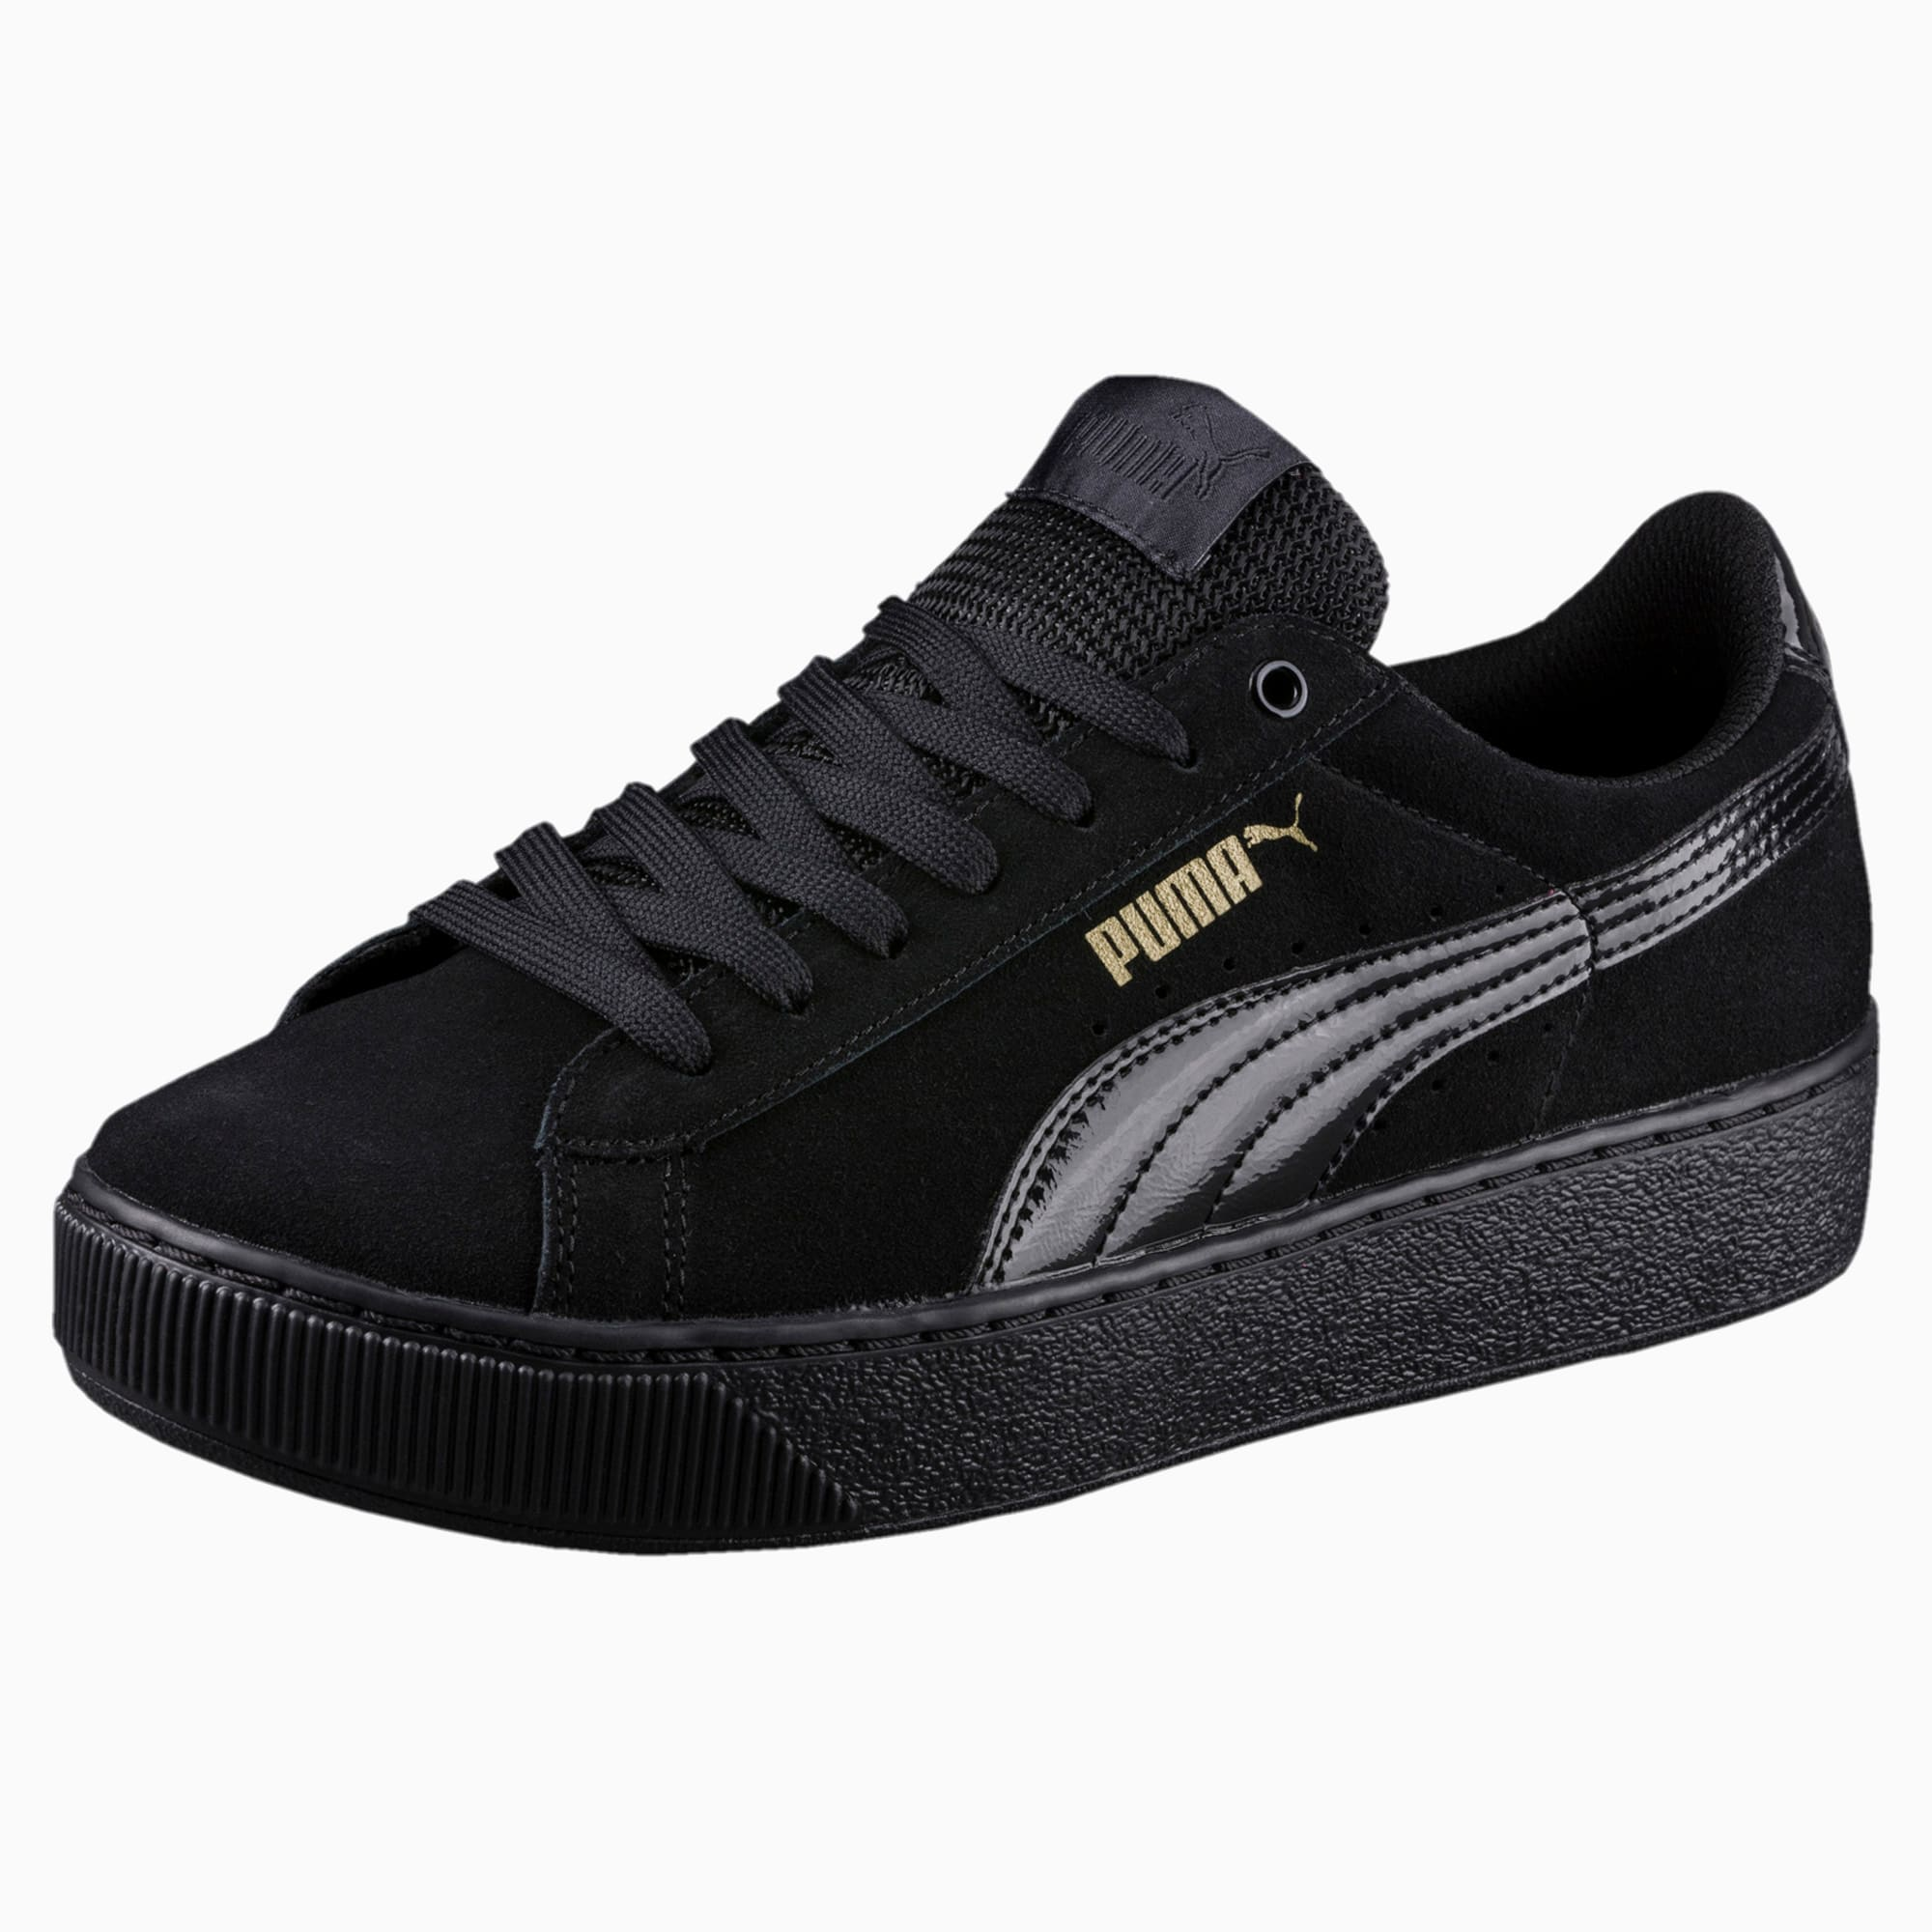 PUMA VIKKY PLATFORM Wildleder Damen Sneakers Schuhe SoftFoam